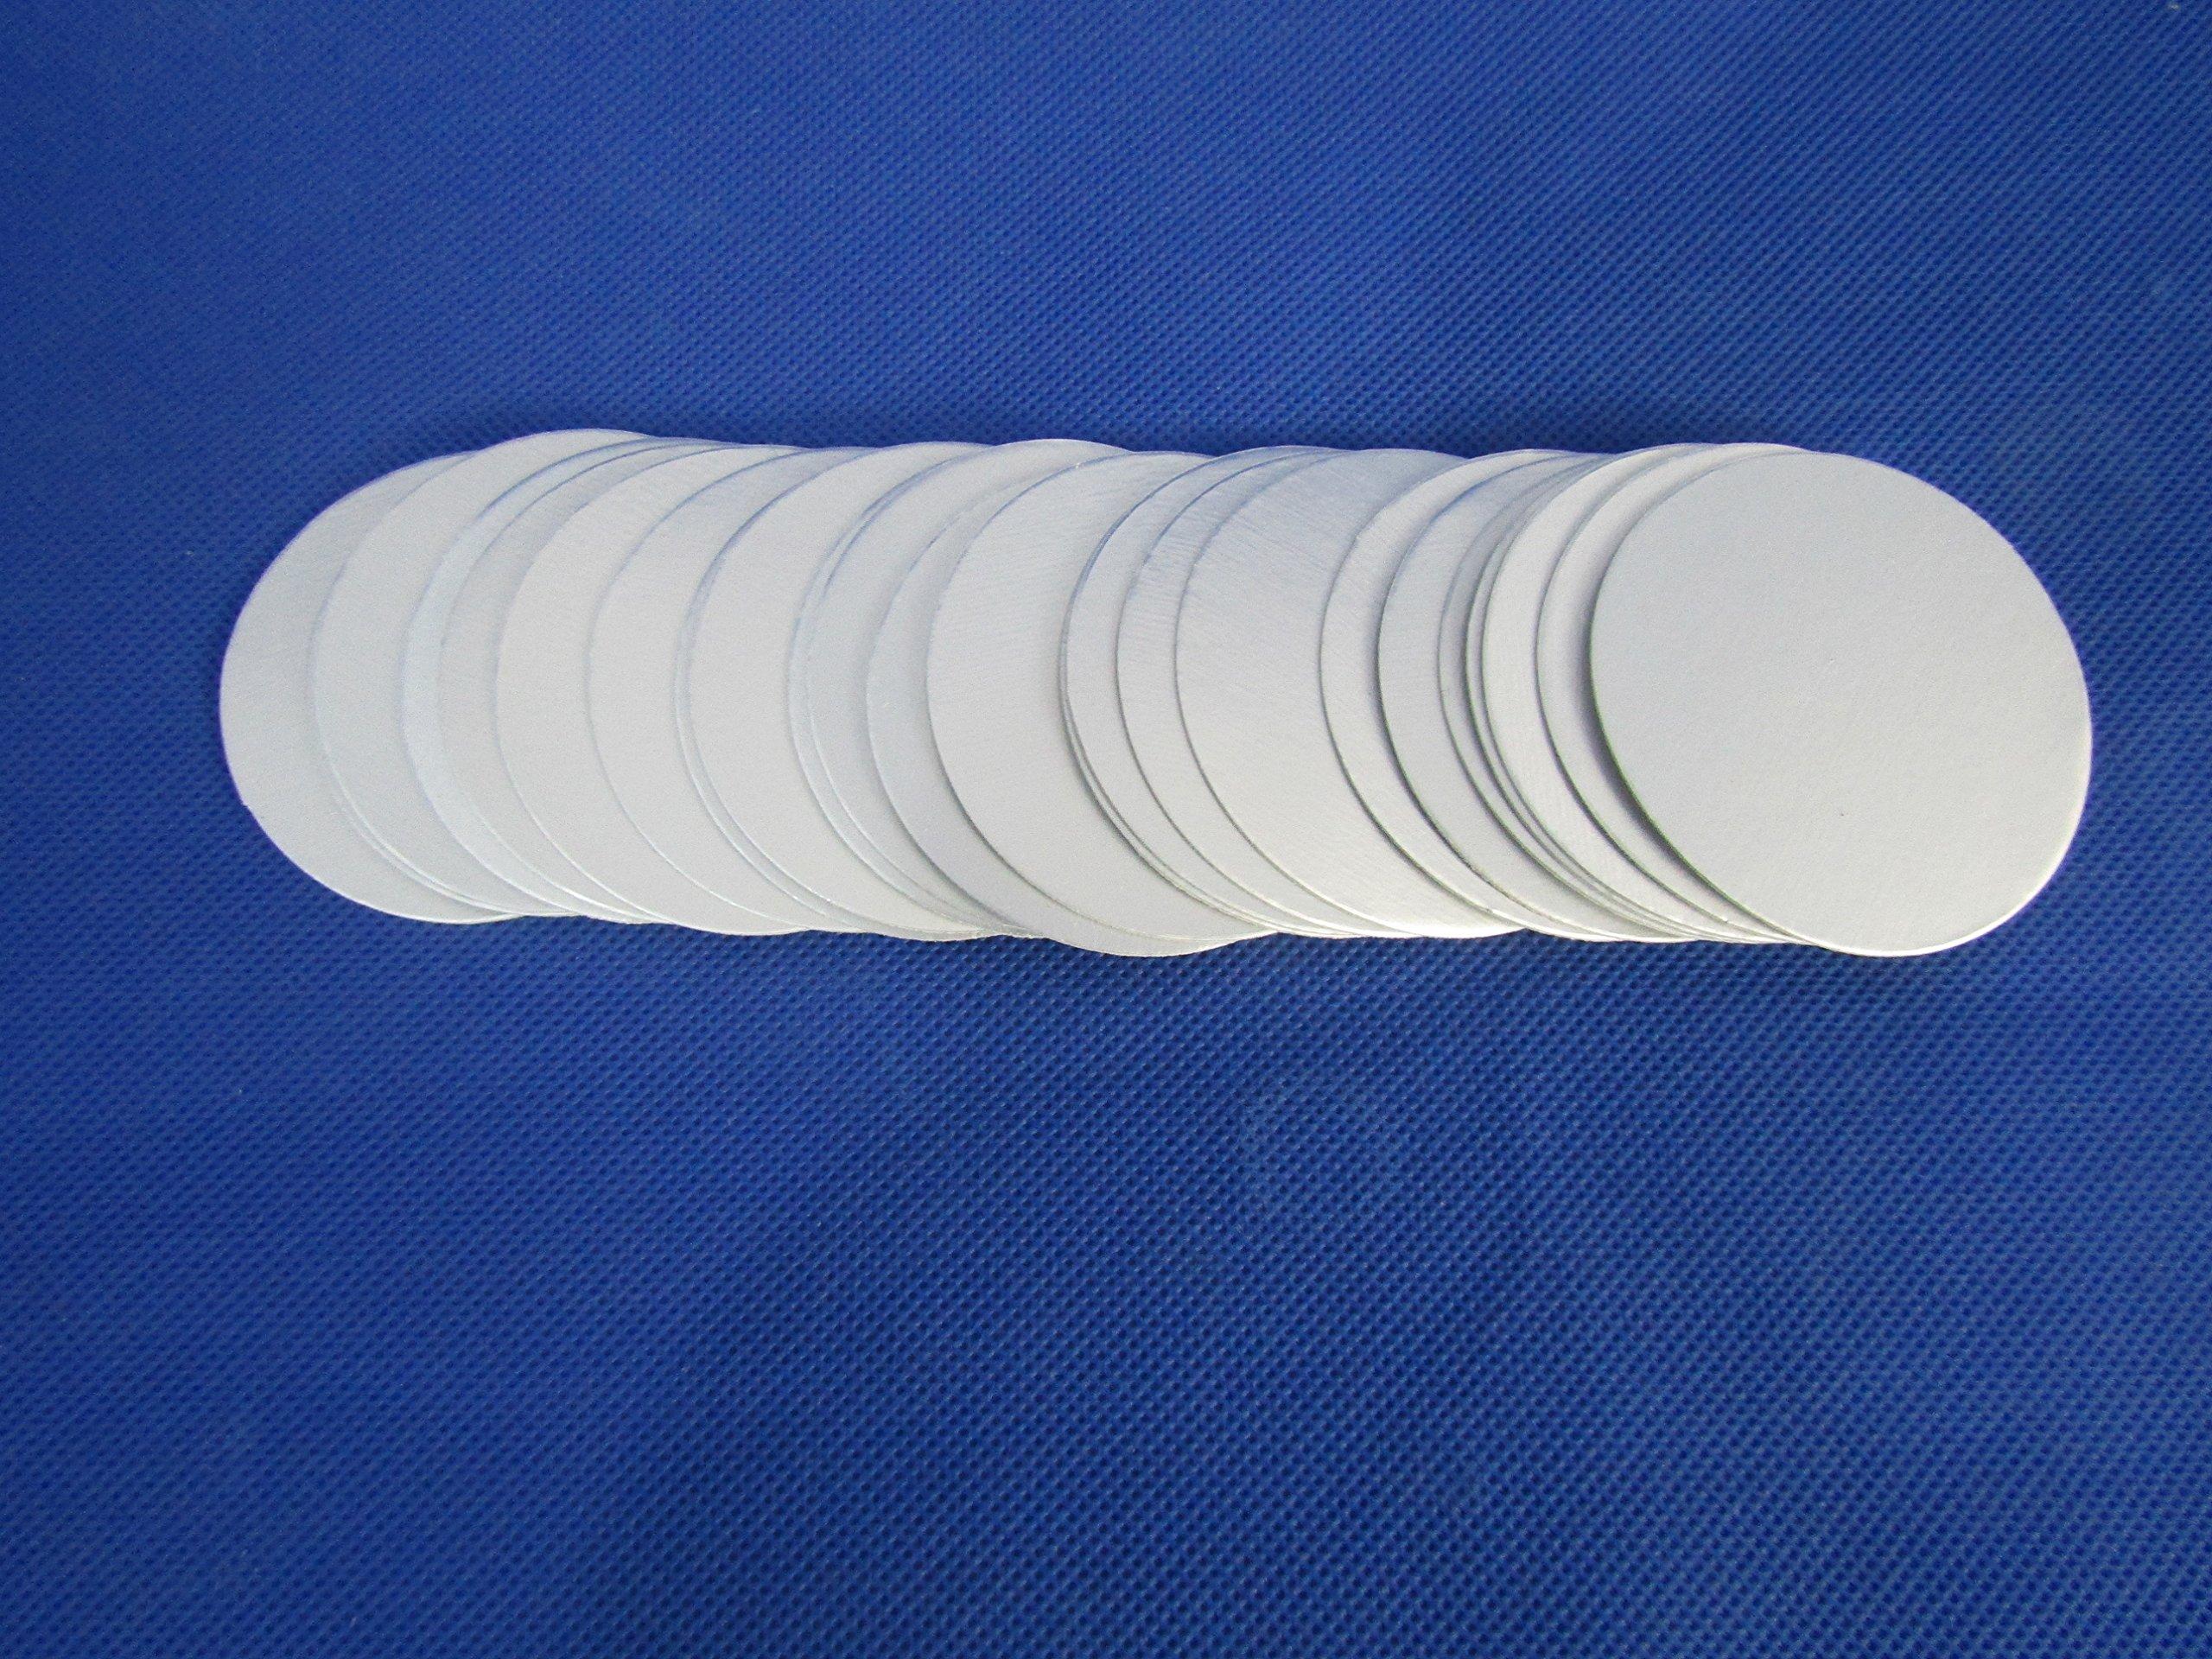 10000pcs 35mm Induction SealingPlastic Laminated Aluminum Foil Lid Liners